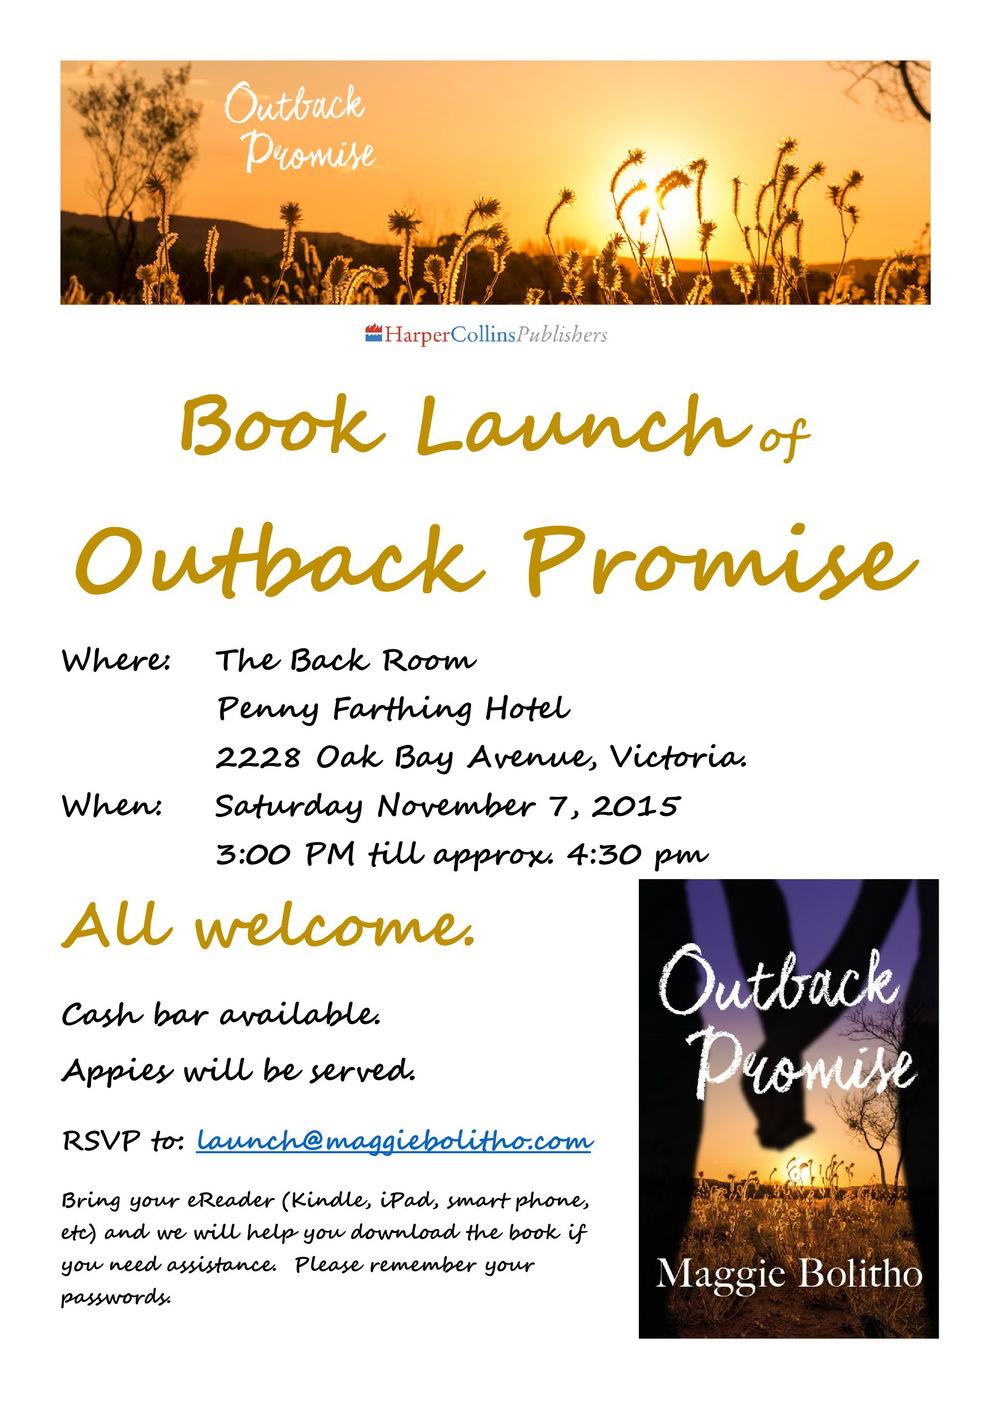 Saturday November 7, 2015 - Book Launch